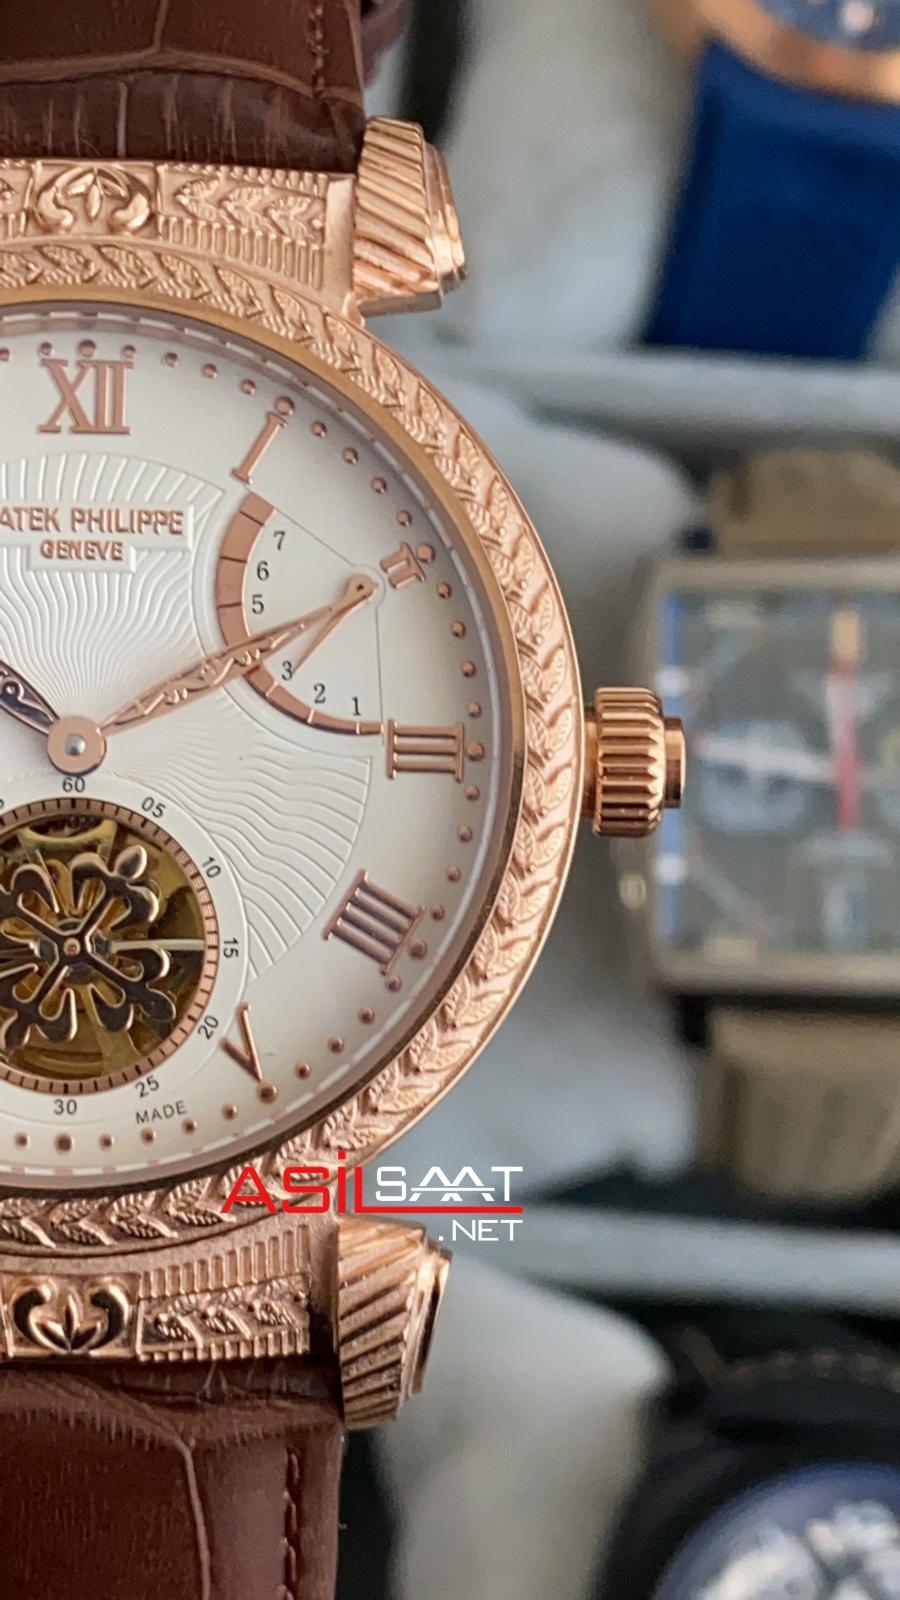 PATEK PHILIPPE Geneve Tourbillon İşlemeli Kasa Rosegold Replika Saat PPTO021